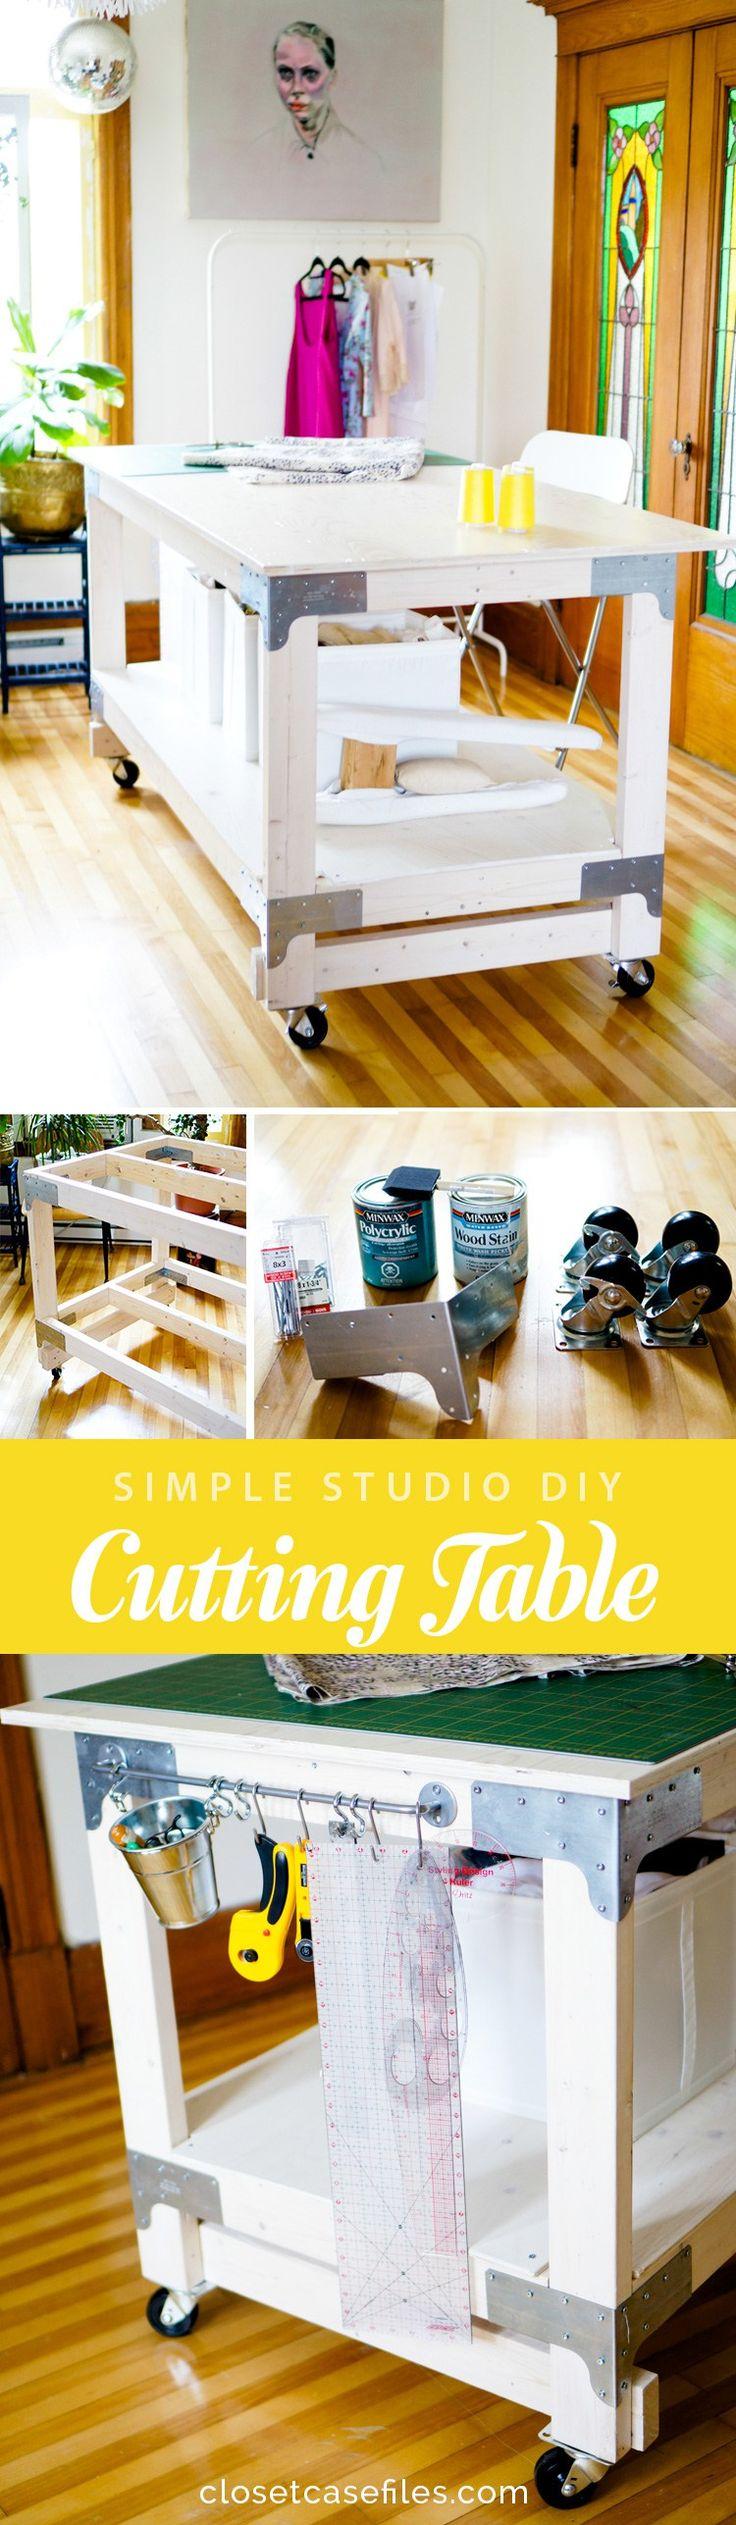 Cutting Table DIY // Simple Studio Project // Closet Case Files